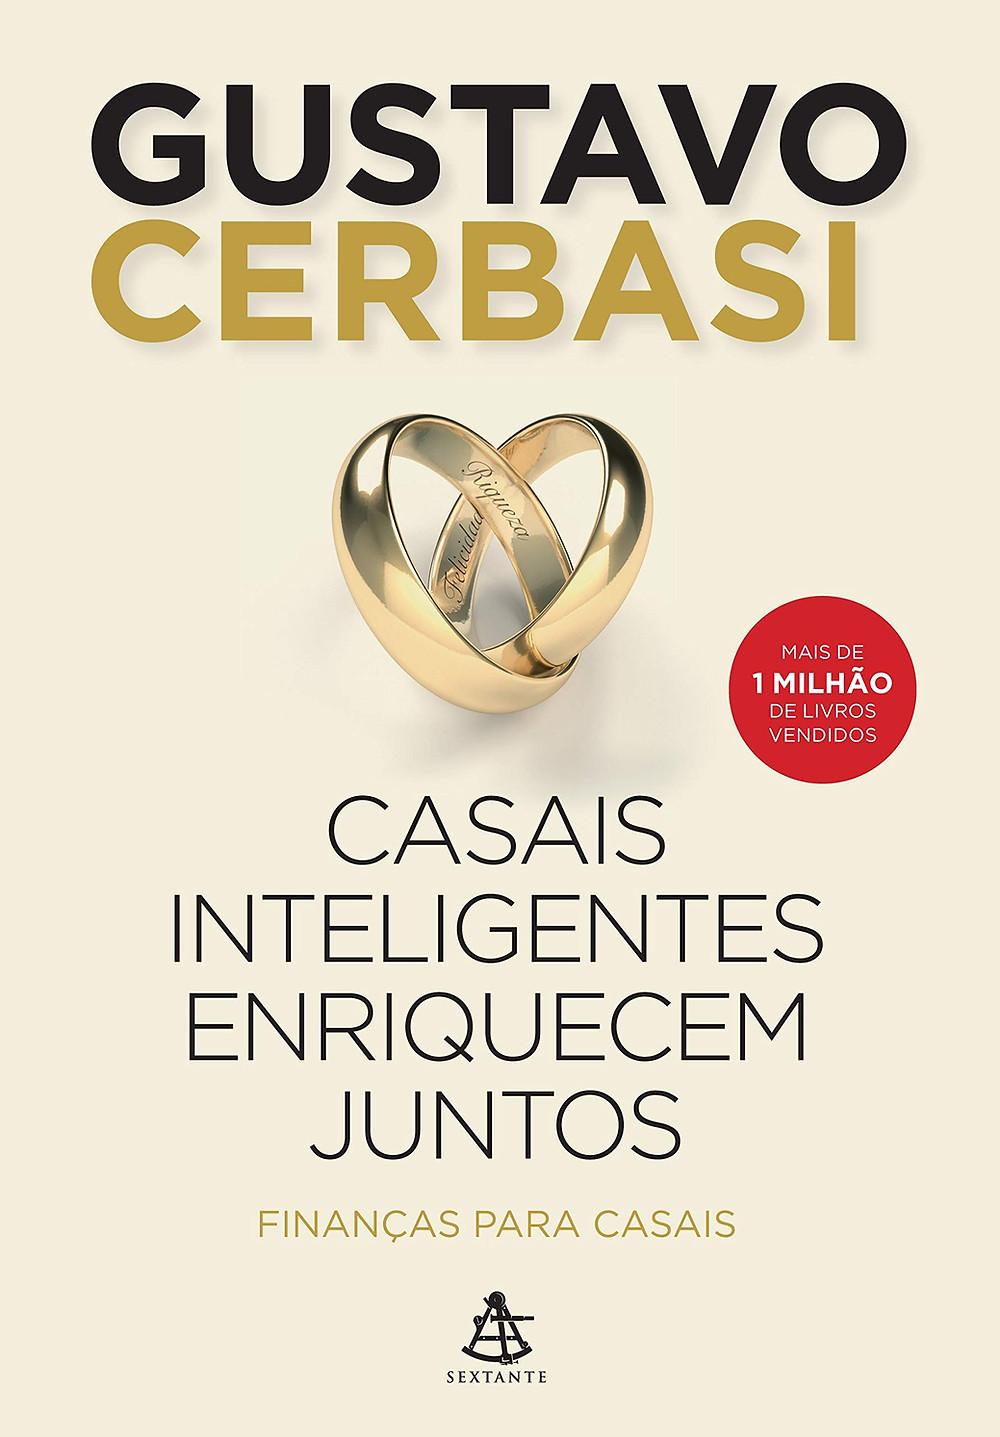 Casais inteligentes enriquecem juntos - Gustavo Cerbasi